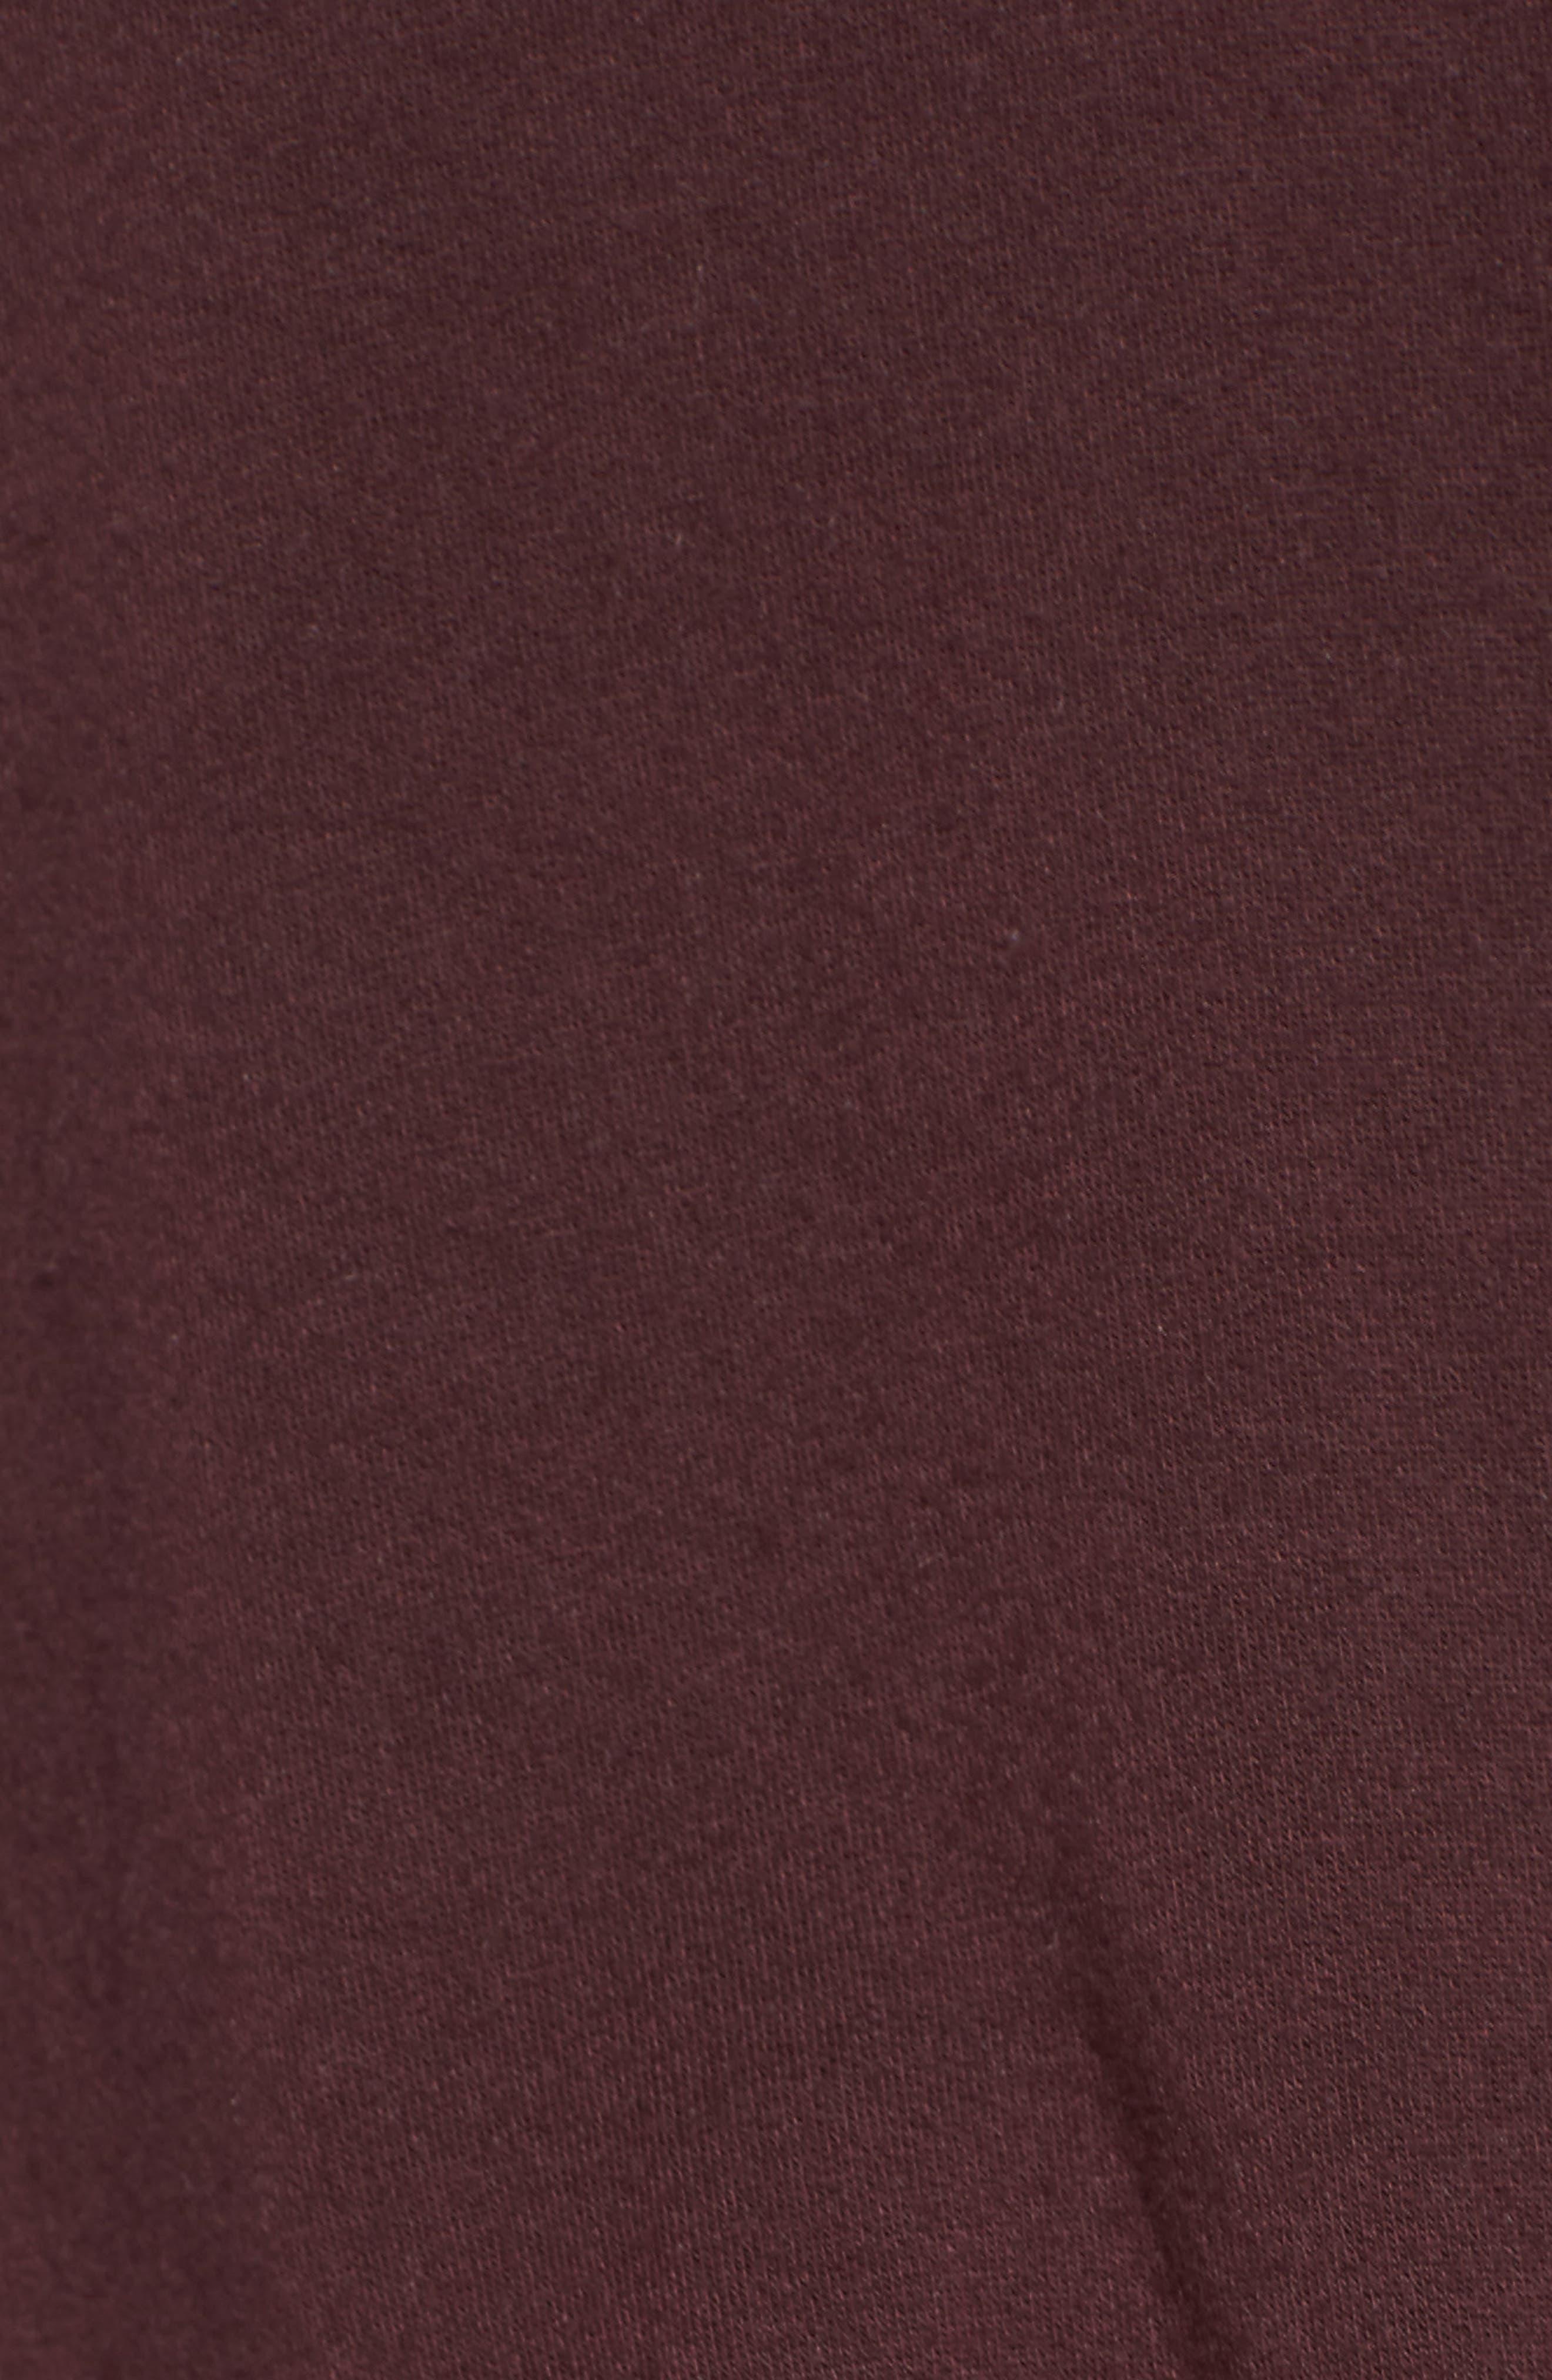 Twist Front Fleece Sweatshirt,                             Alternate thumbnail 5, color,                             Wine